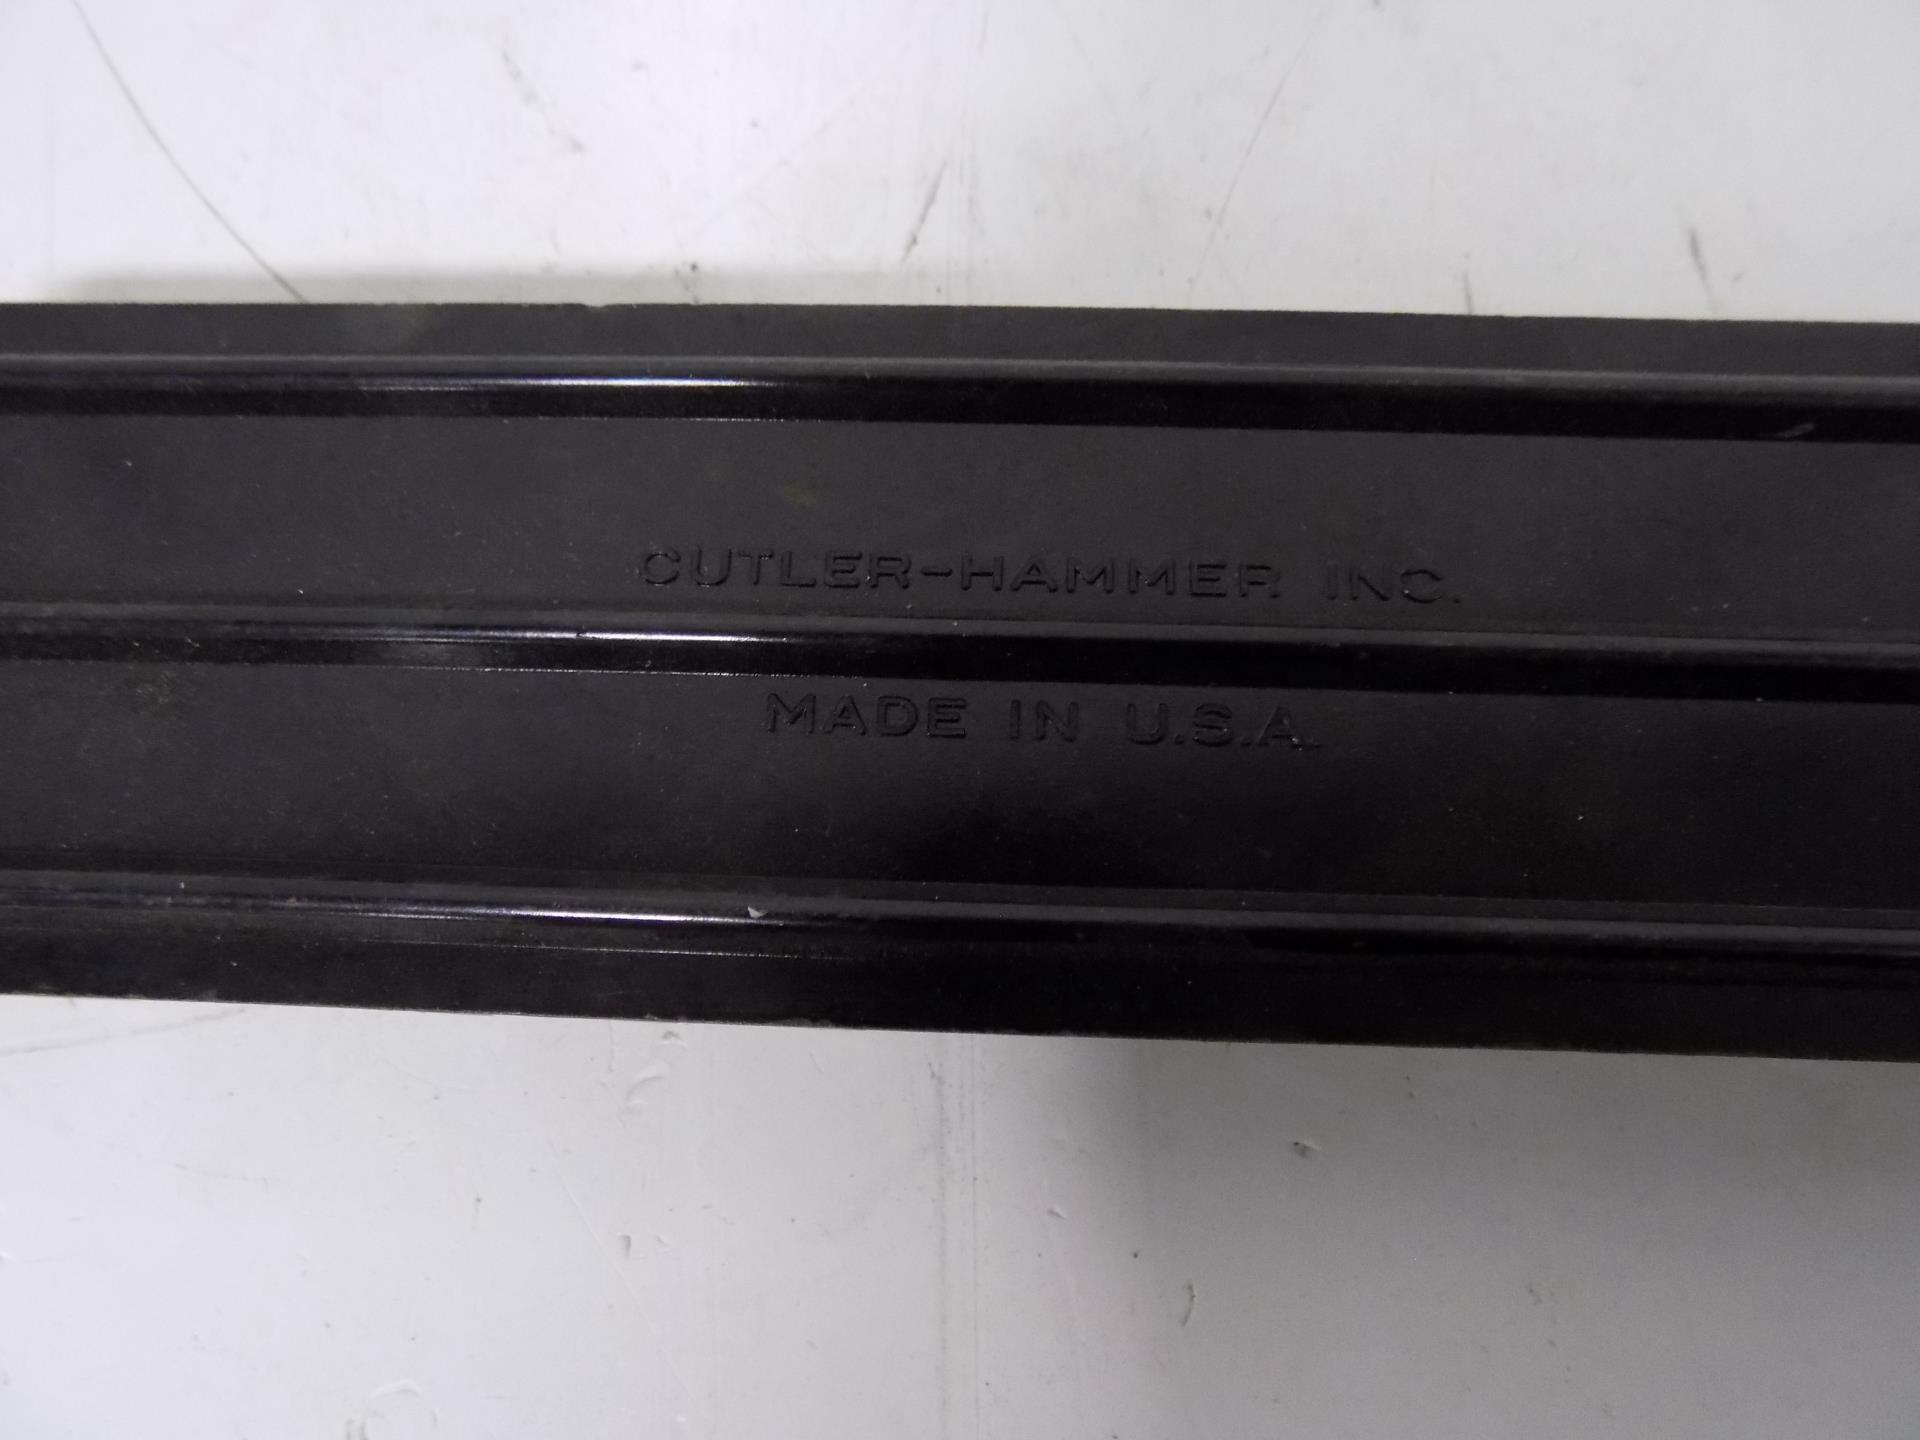 Large 12 position Screw Connector Terminal Strip Block Cutler Hammer Inc USA